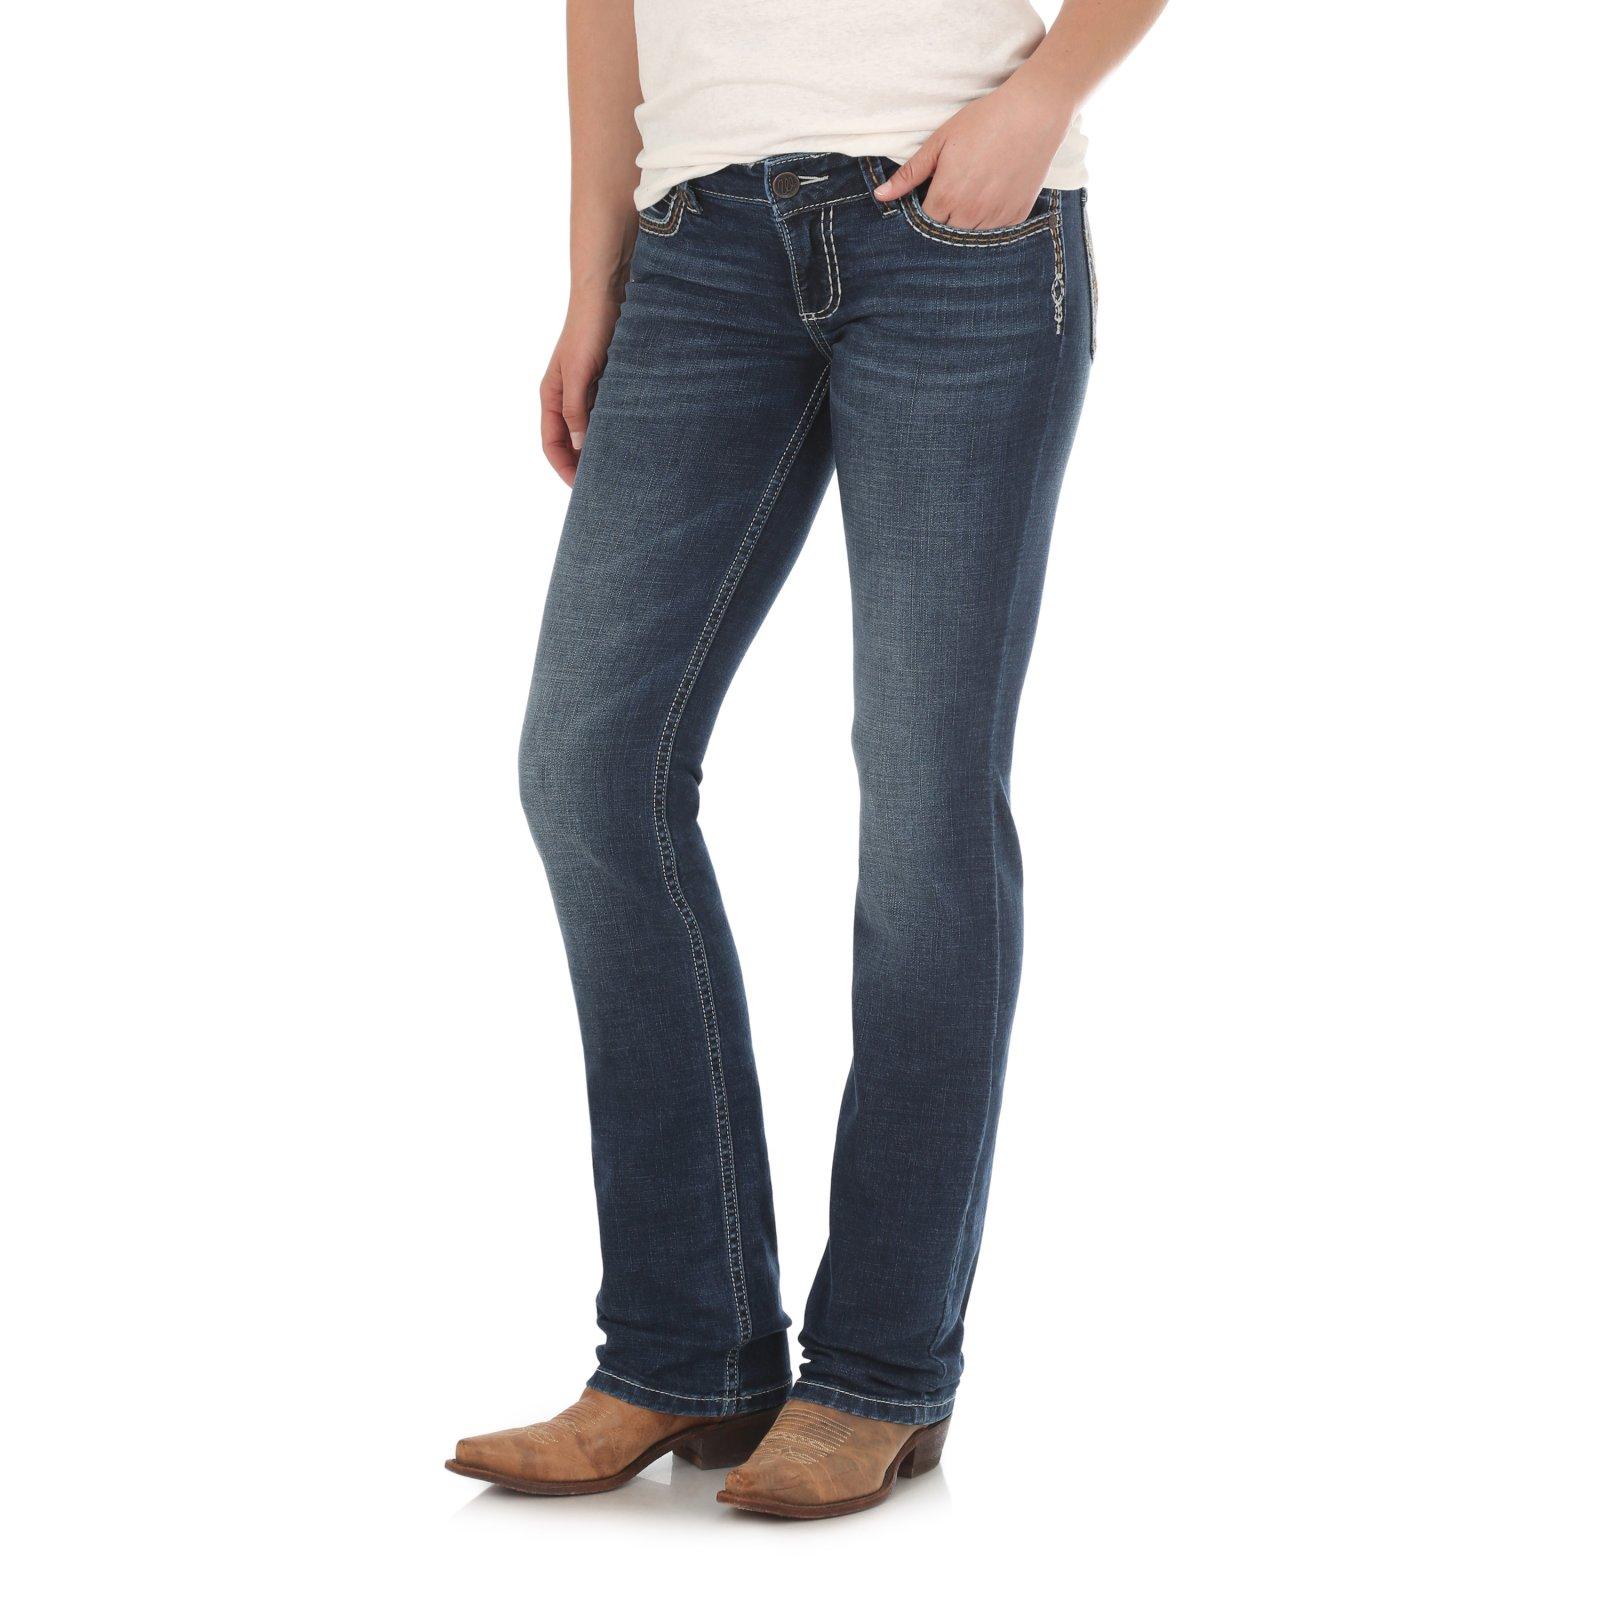 Retro Mae Mid-Rise Jean from Wrangler